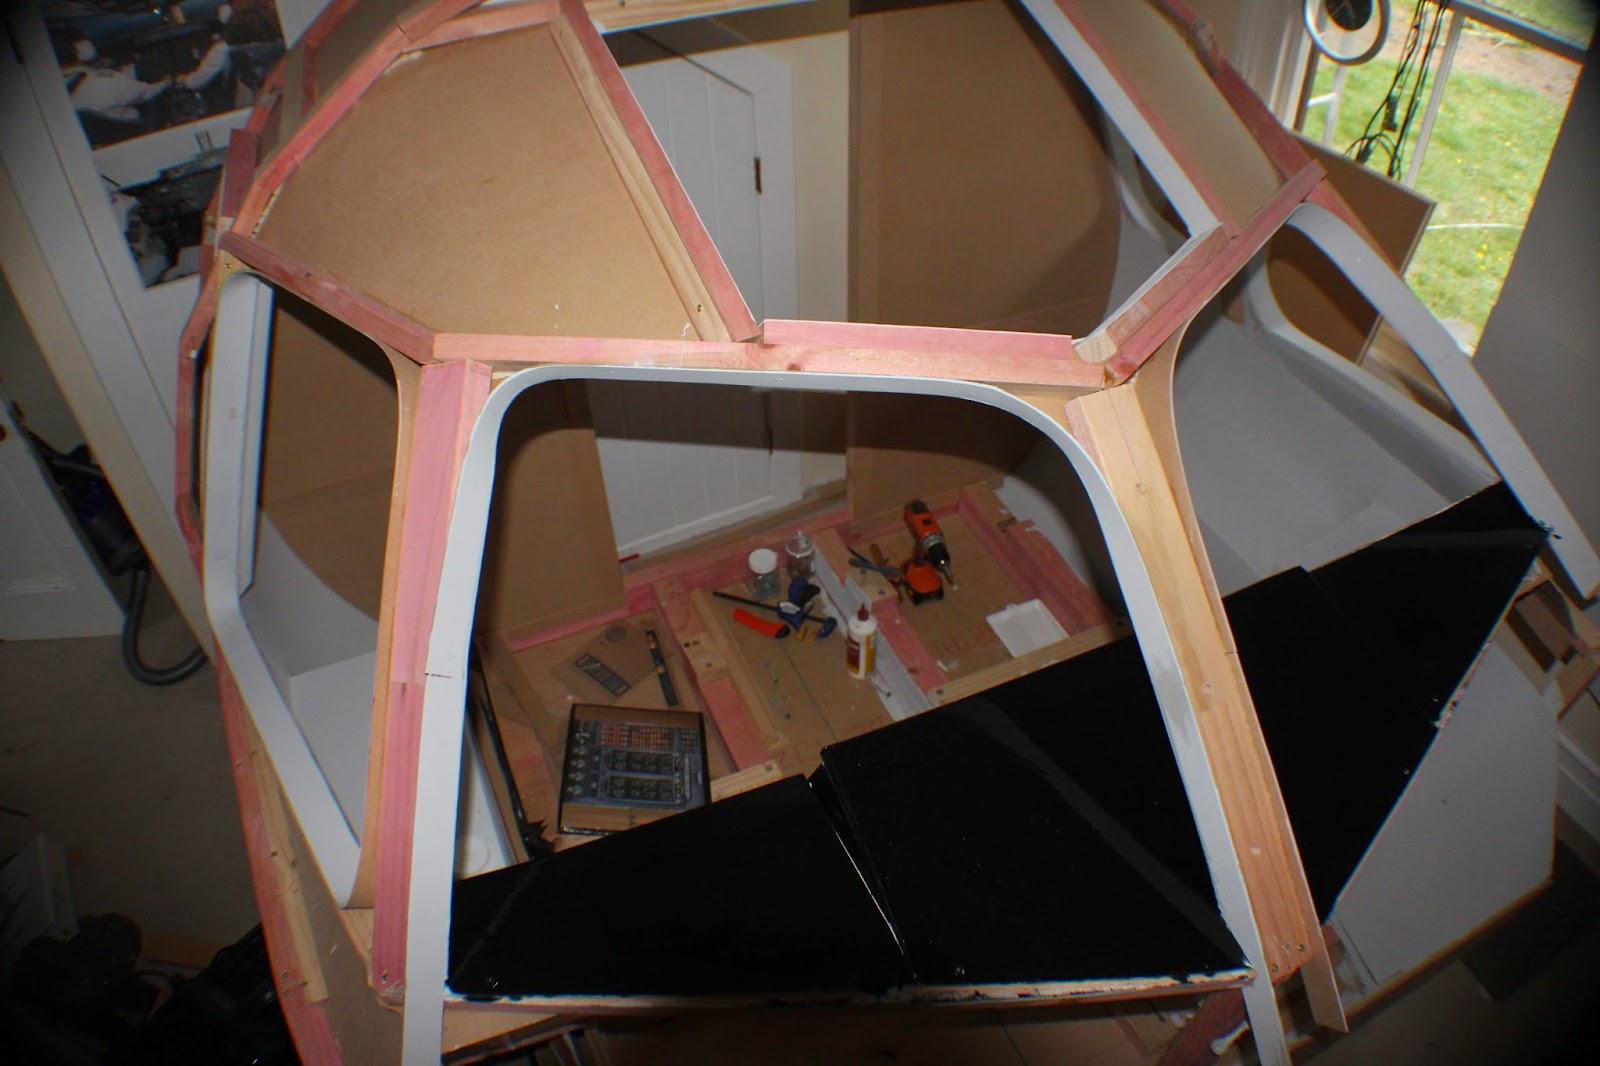 BAE 146 - Home Built Flight Sim: A little bit of an earthquake